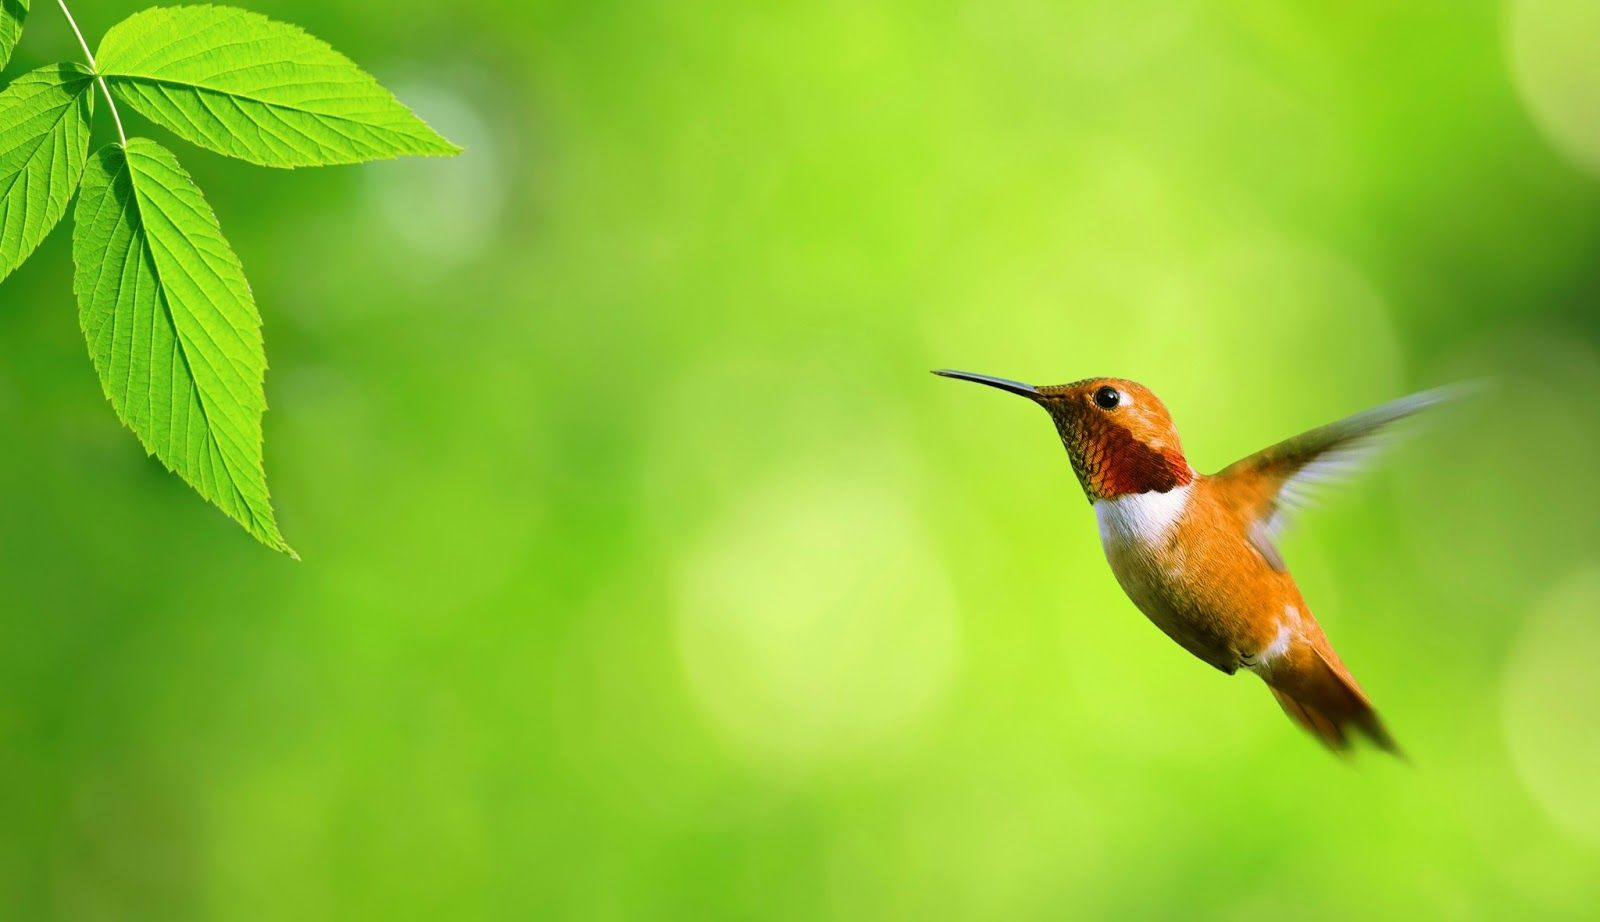 Birds Wallpapers High Resolution